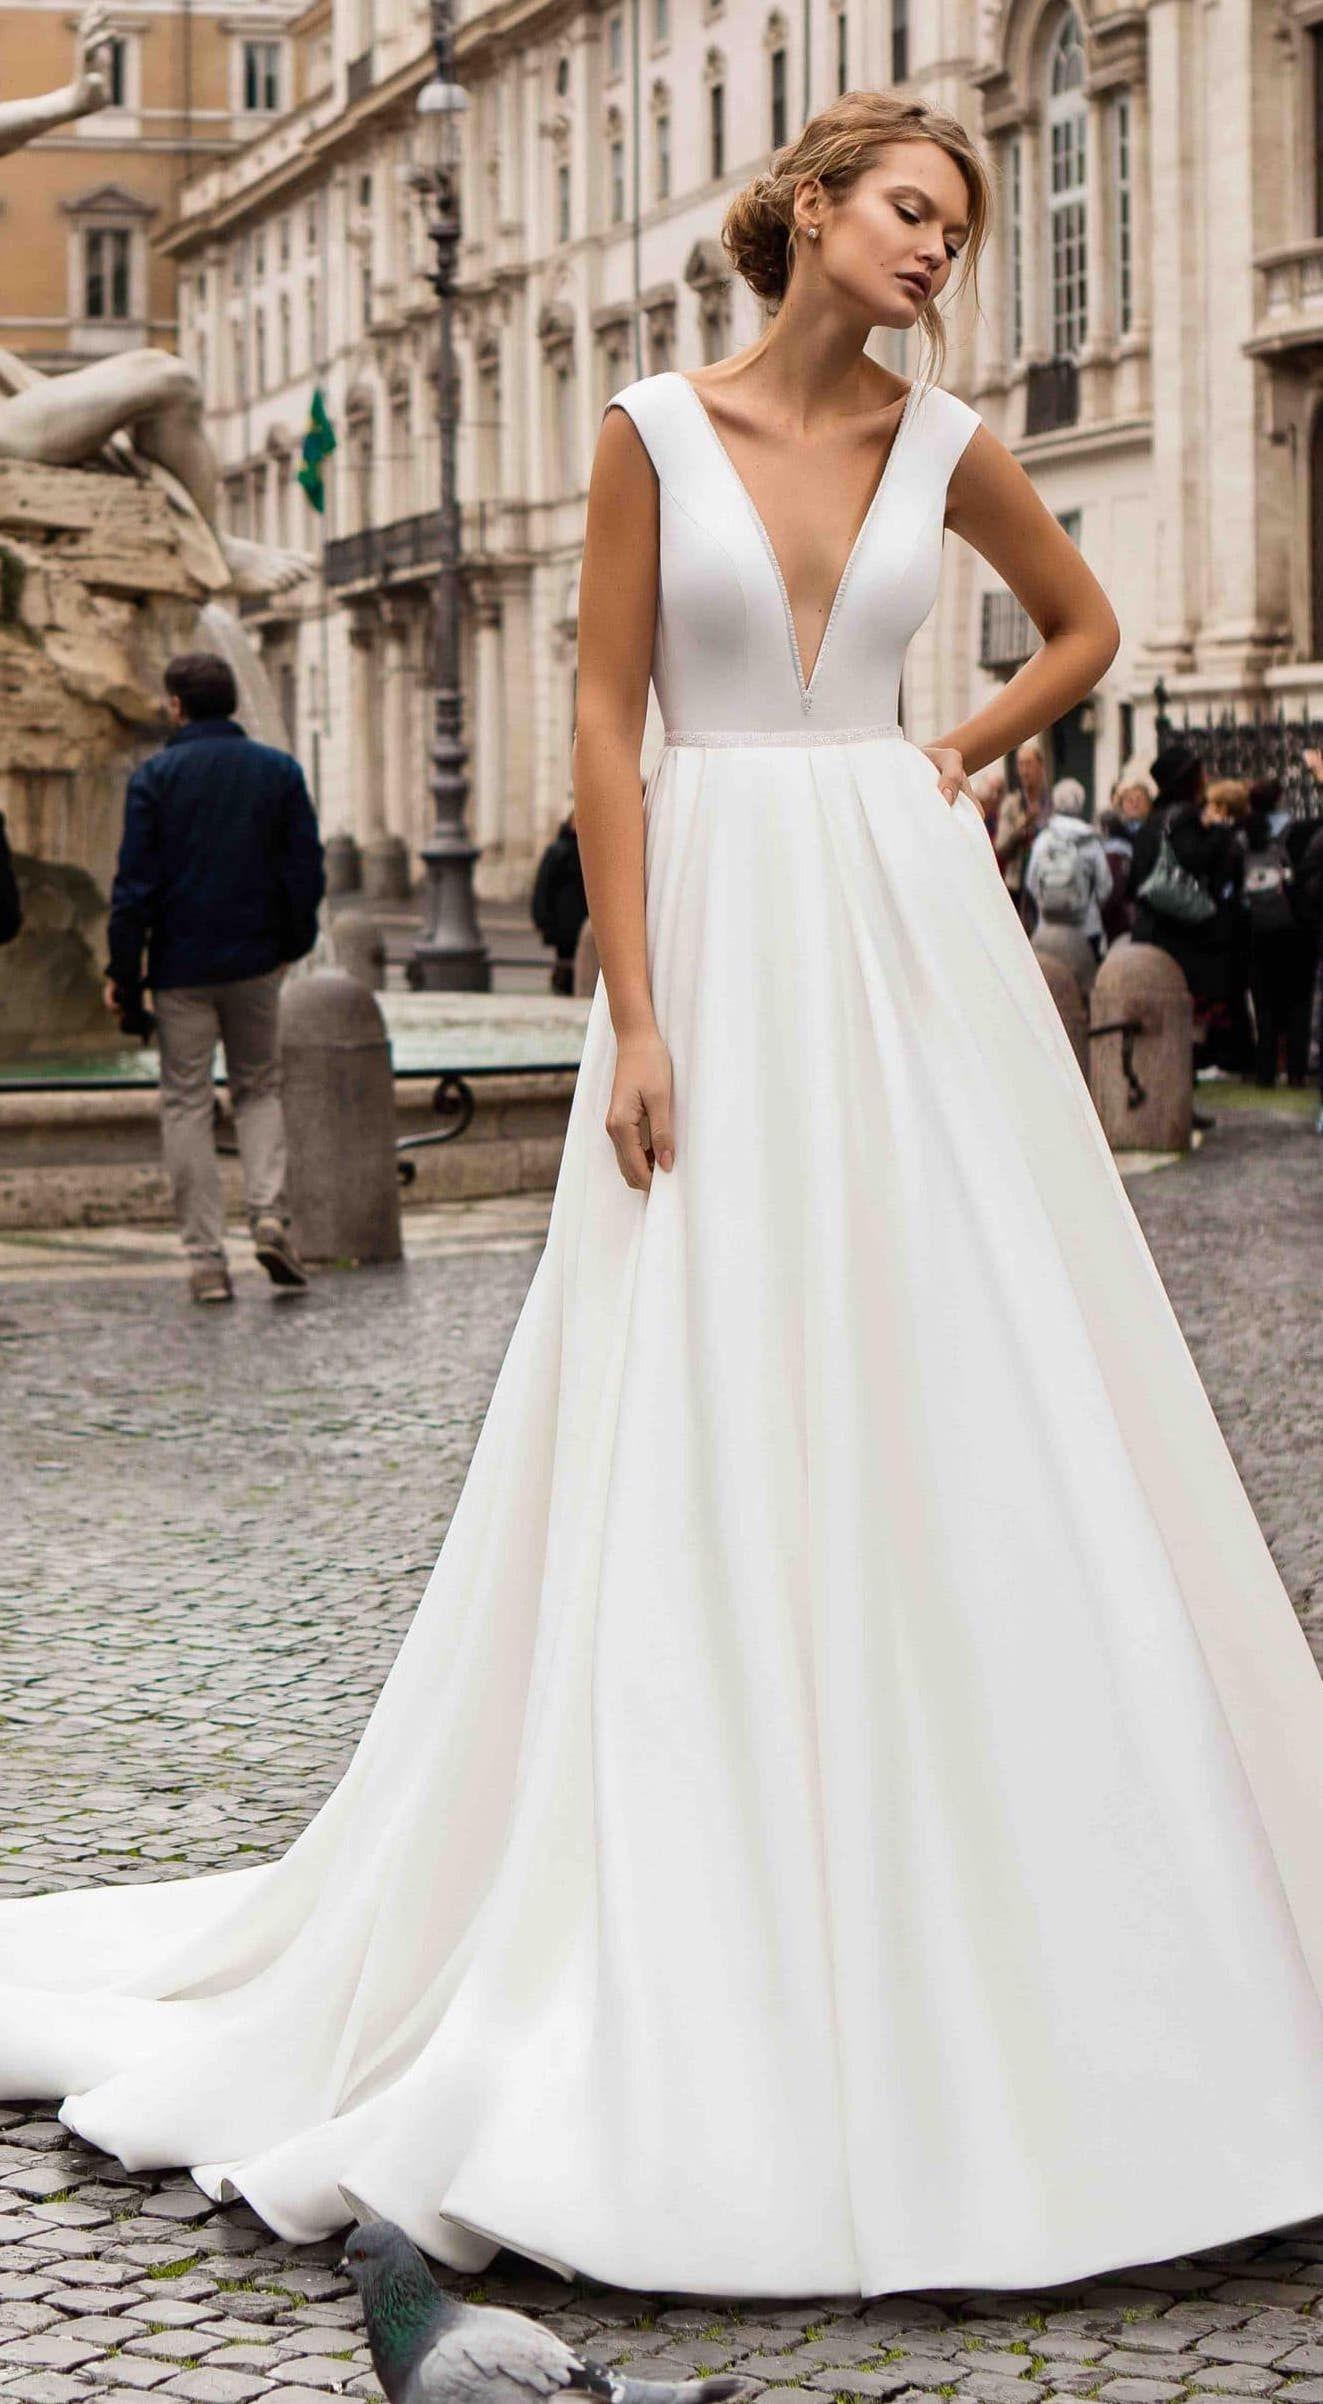 789626c92 Simple ball gown wedding dress by Innocentioa - Porcia Cattonis sleeveless  princess deep v-neckline #weddingdress #weddingdresses #bridalgown #bridal  ...